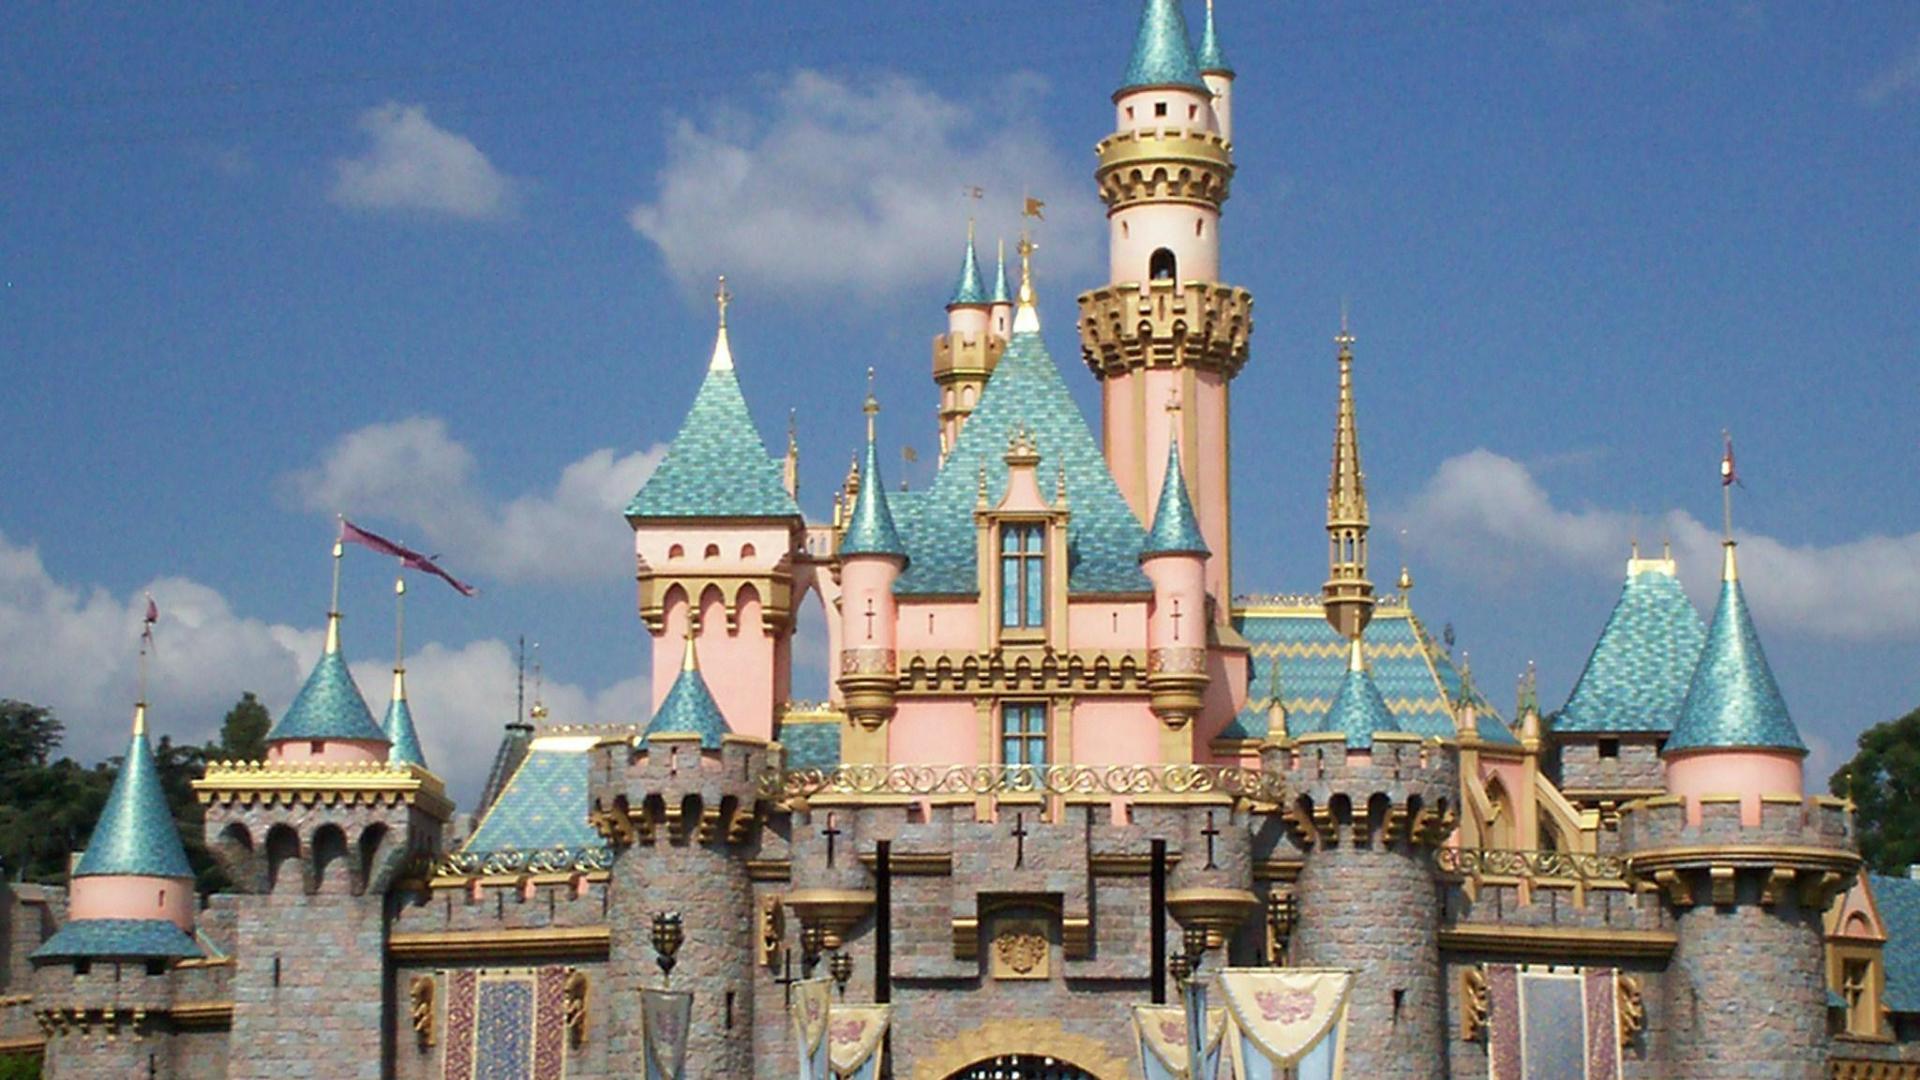 High Resolution Disney Wallpaper: Disneyland Wallpaper Desktop 1600x900